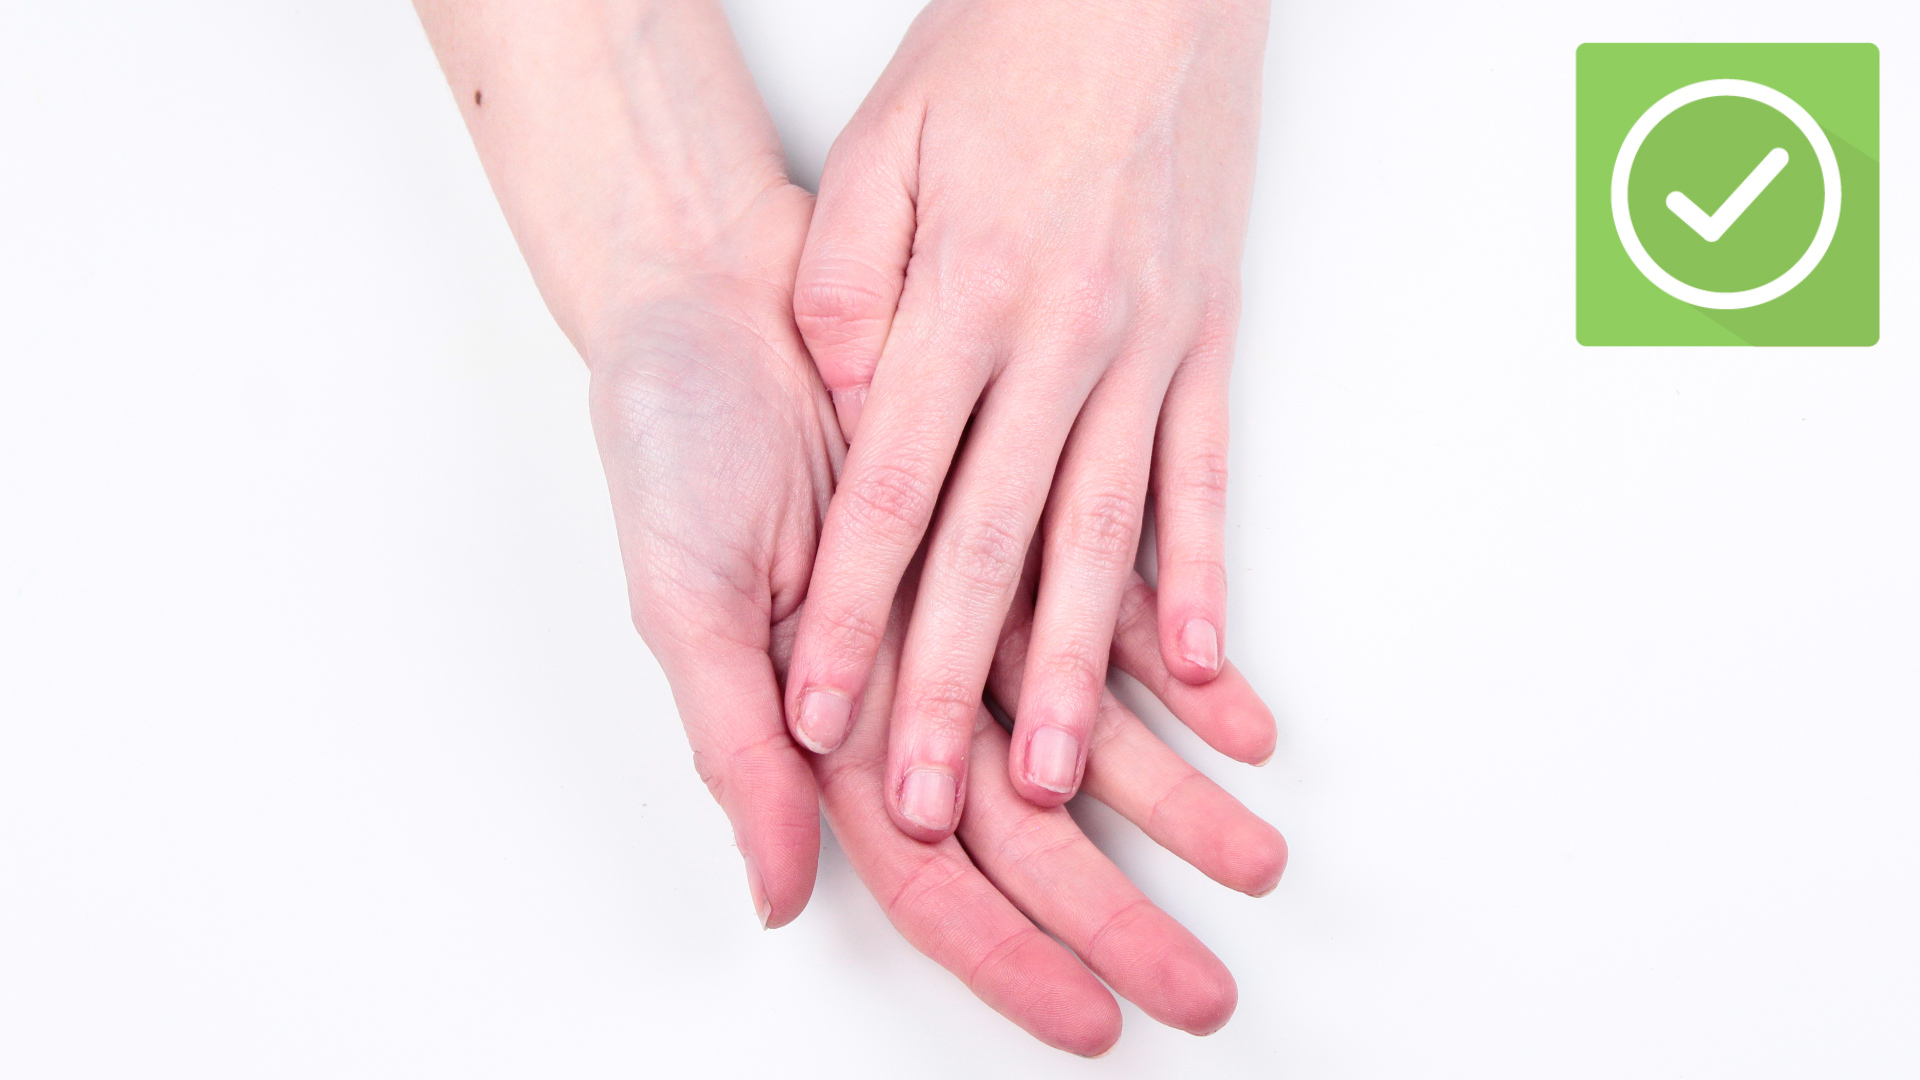 3 Ways to Remove Acrylic Nails  wikiHow